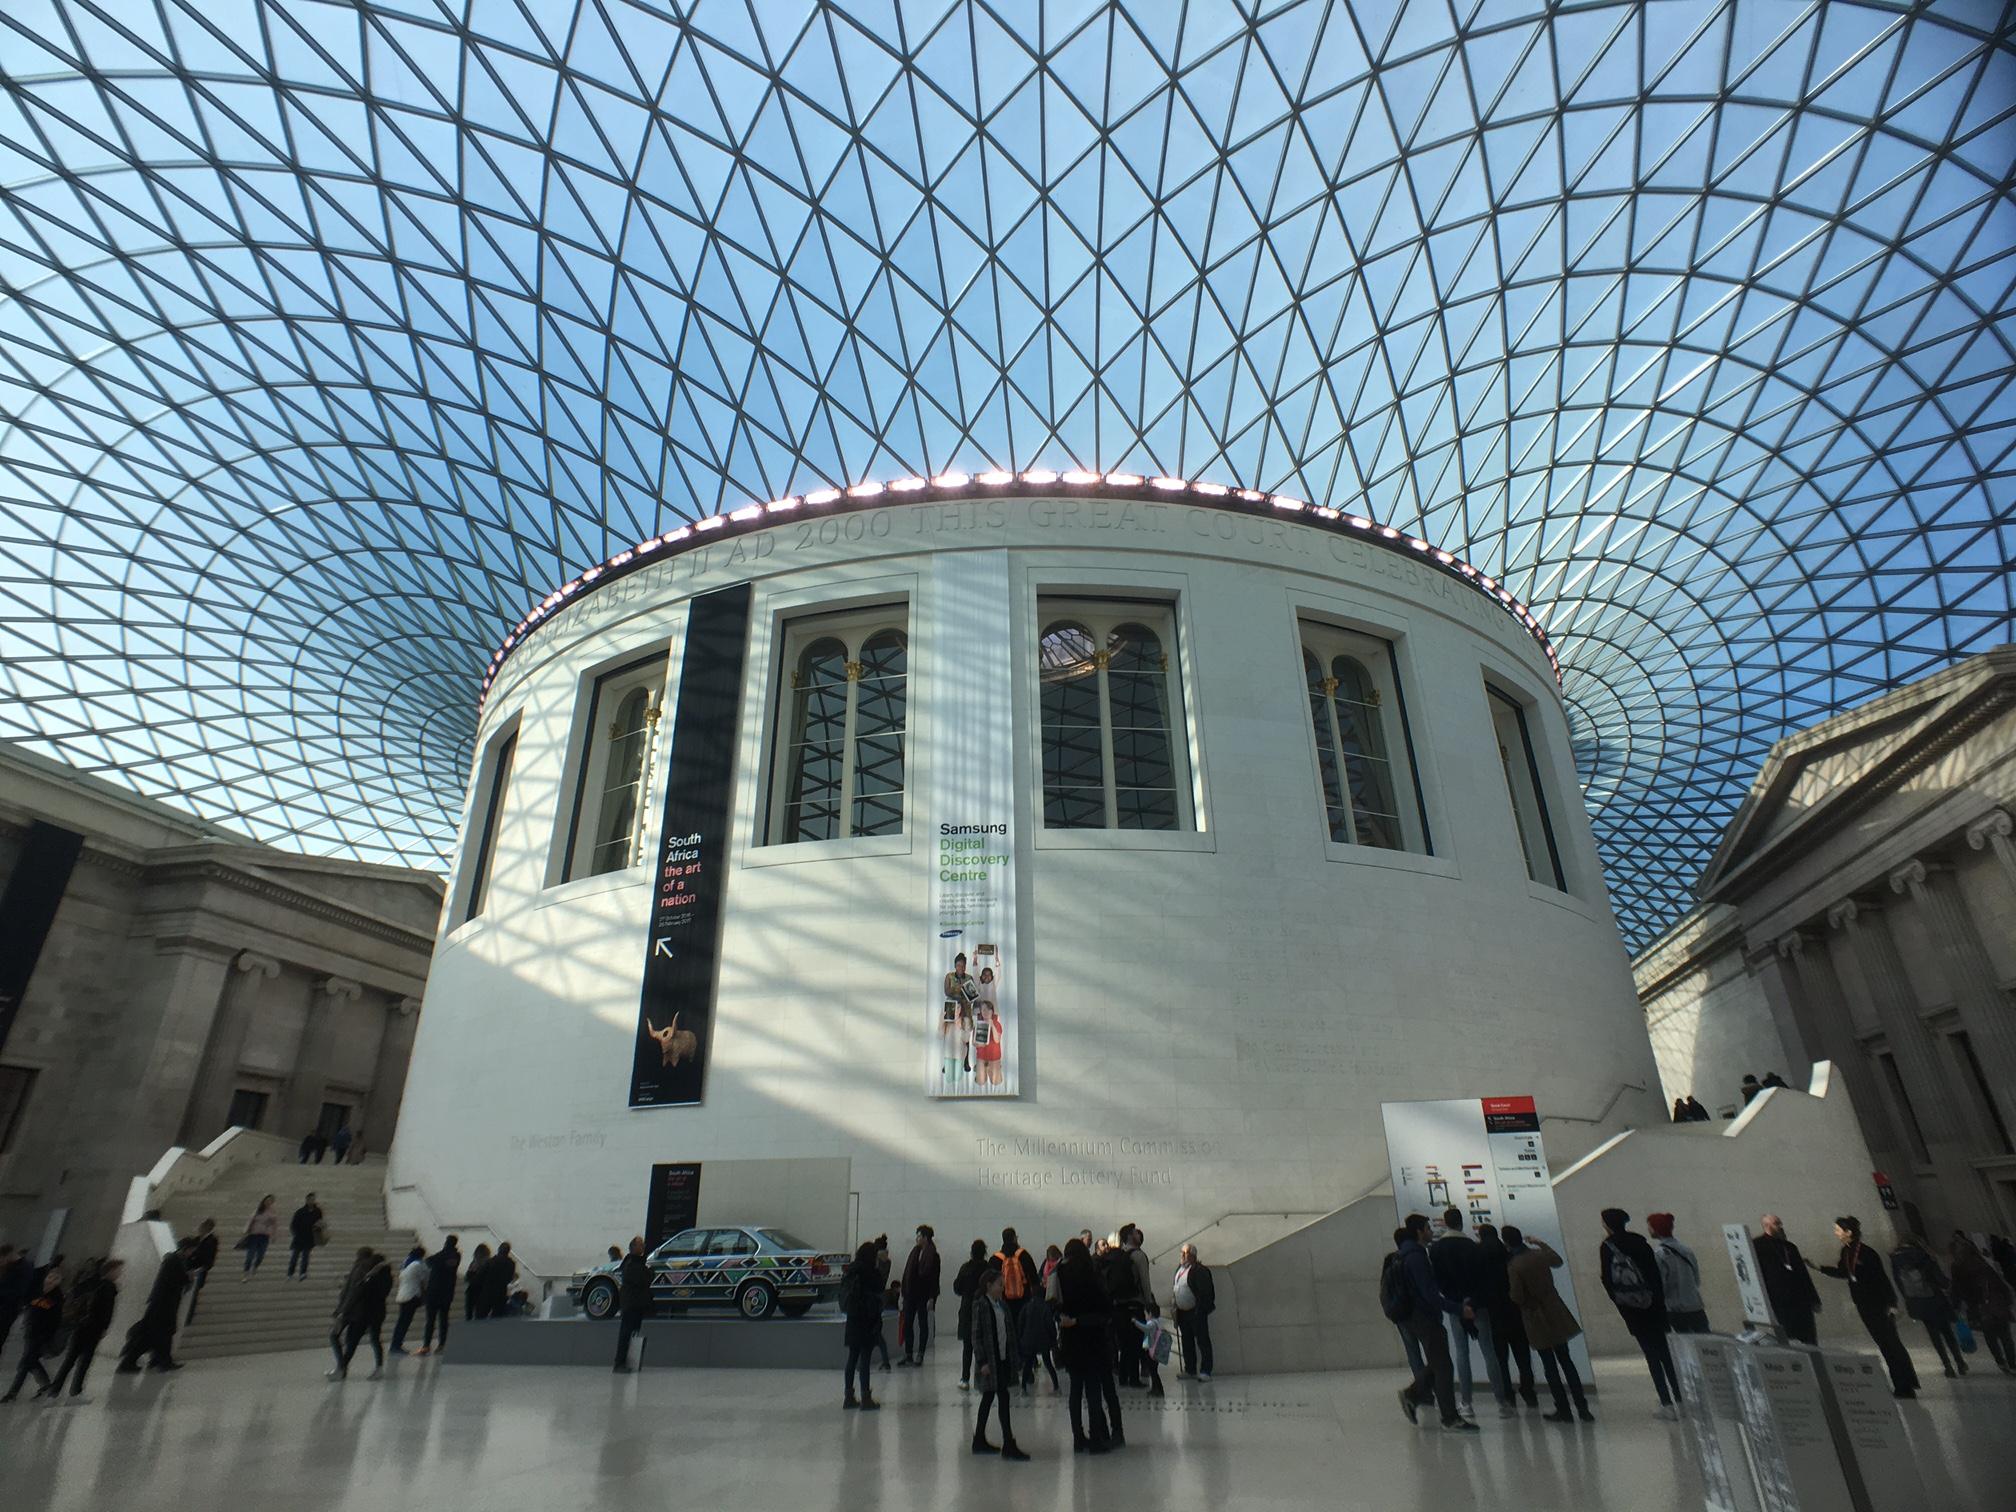 BritMuseum1.jpg